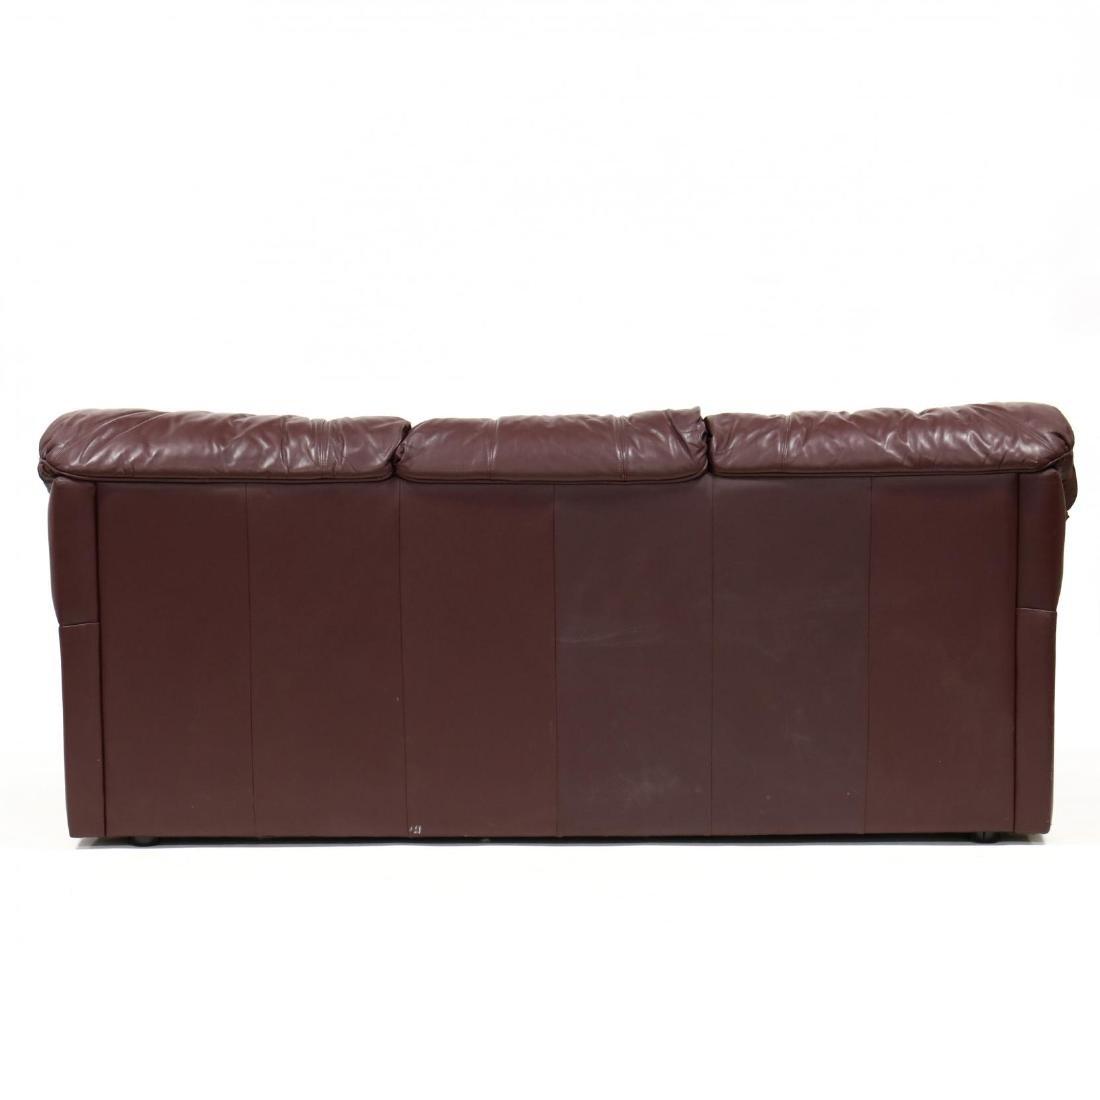 Modern Leather Sofa - 4